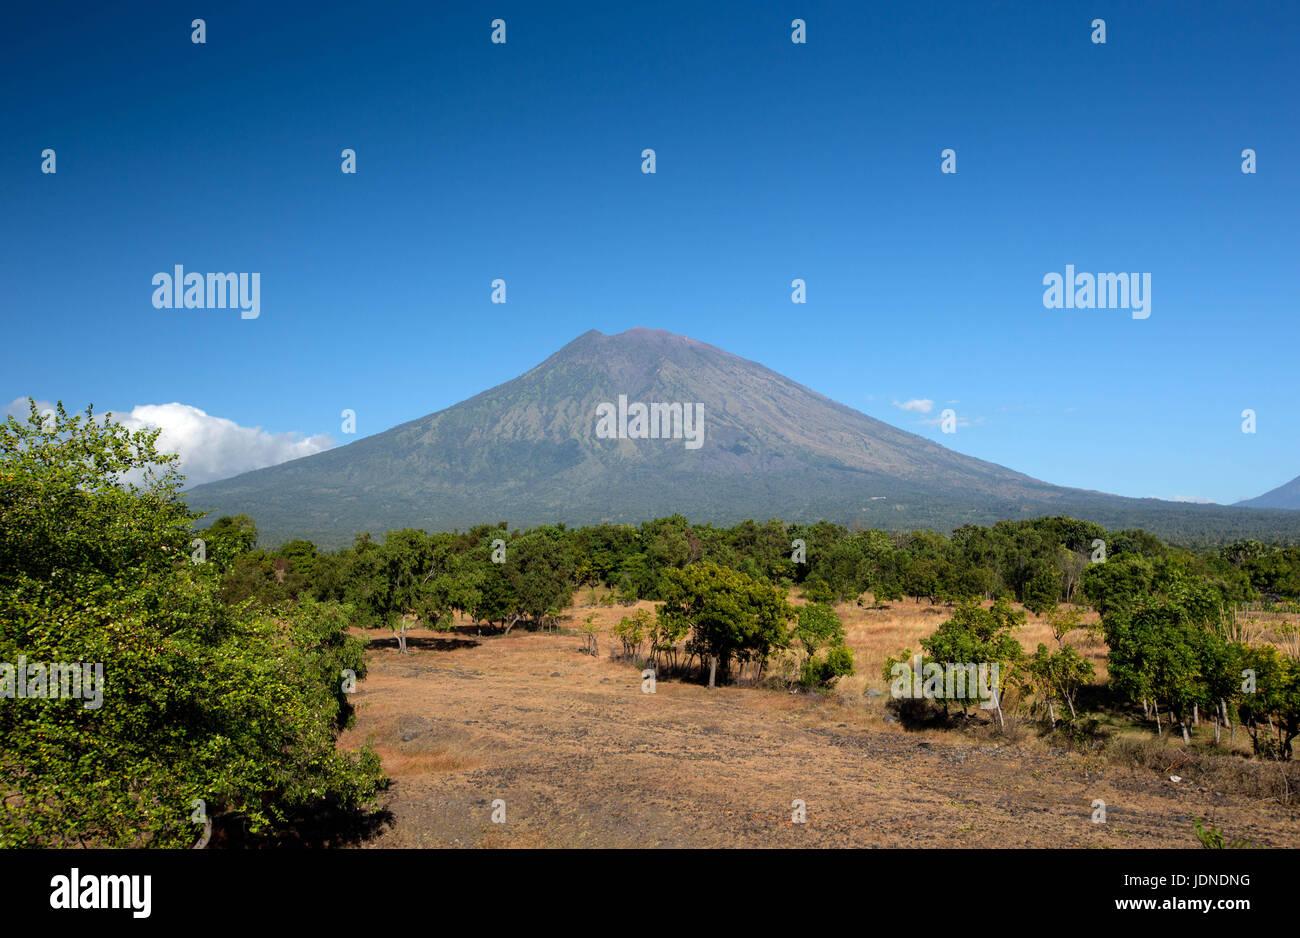 Mount Agung in Bali, Indonesia Near Ubud - Stock Image